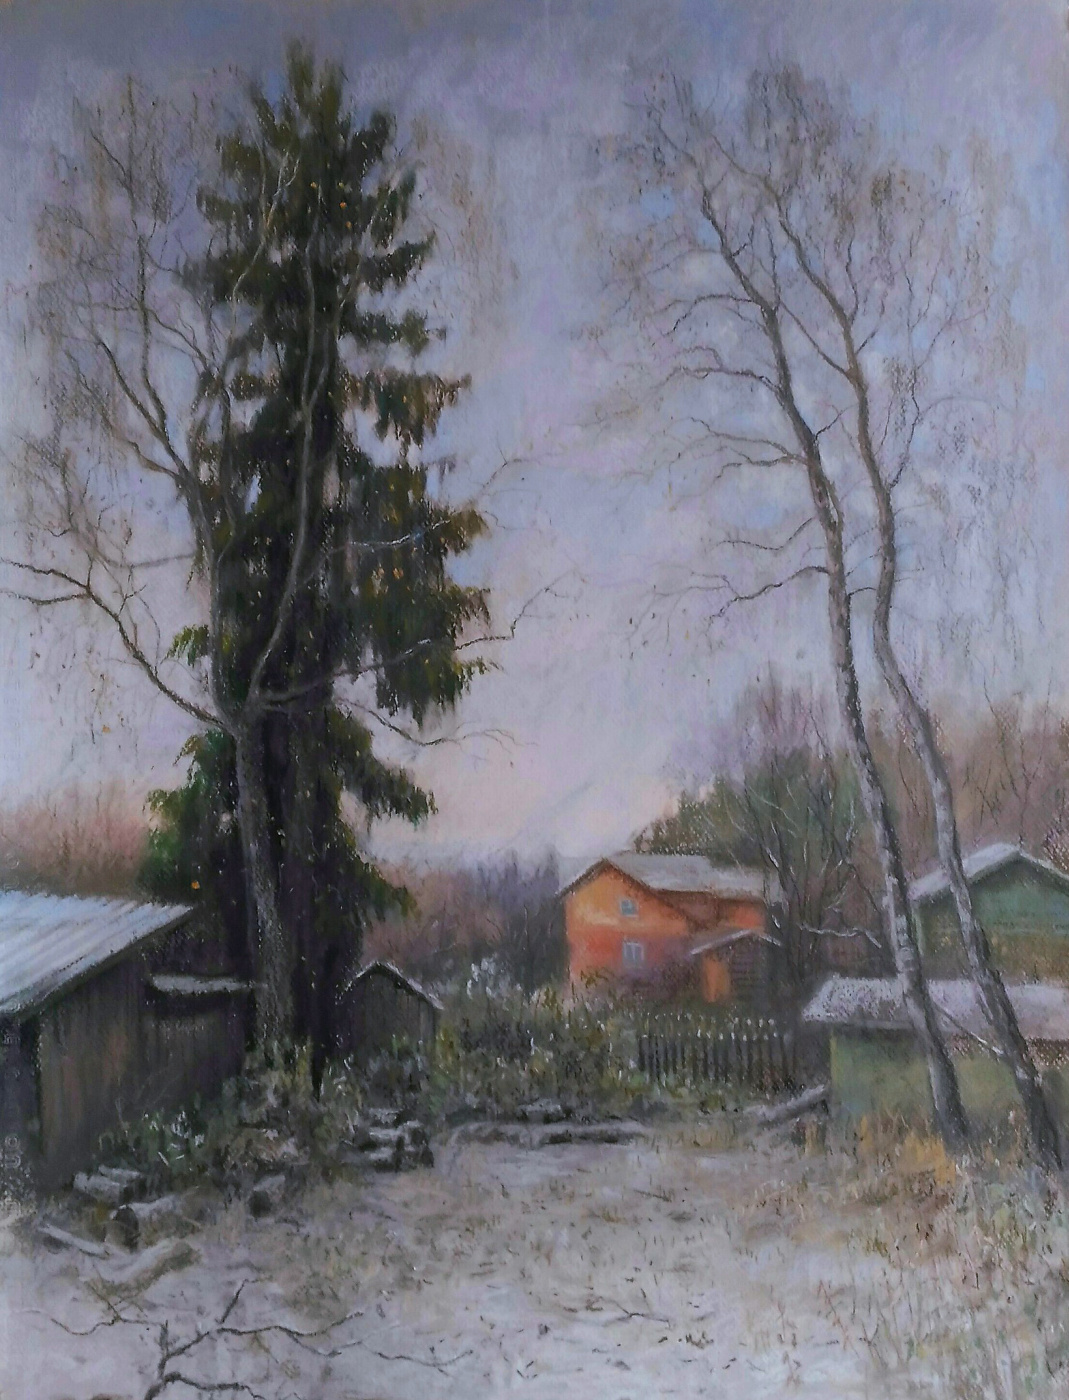 Ольга Акрилова. November in the village Solmanovo